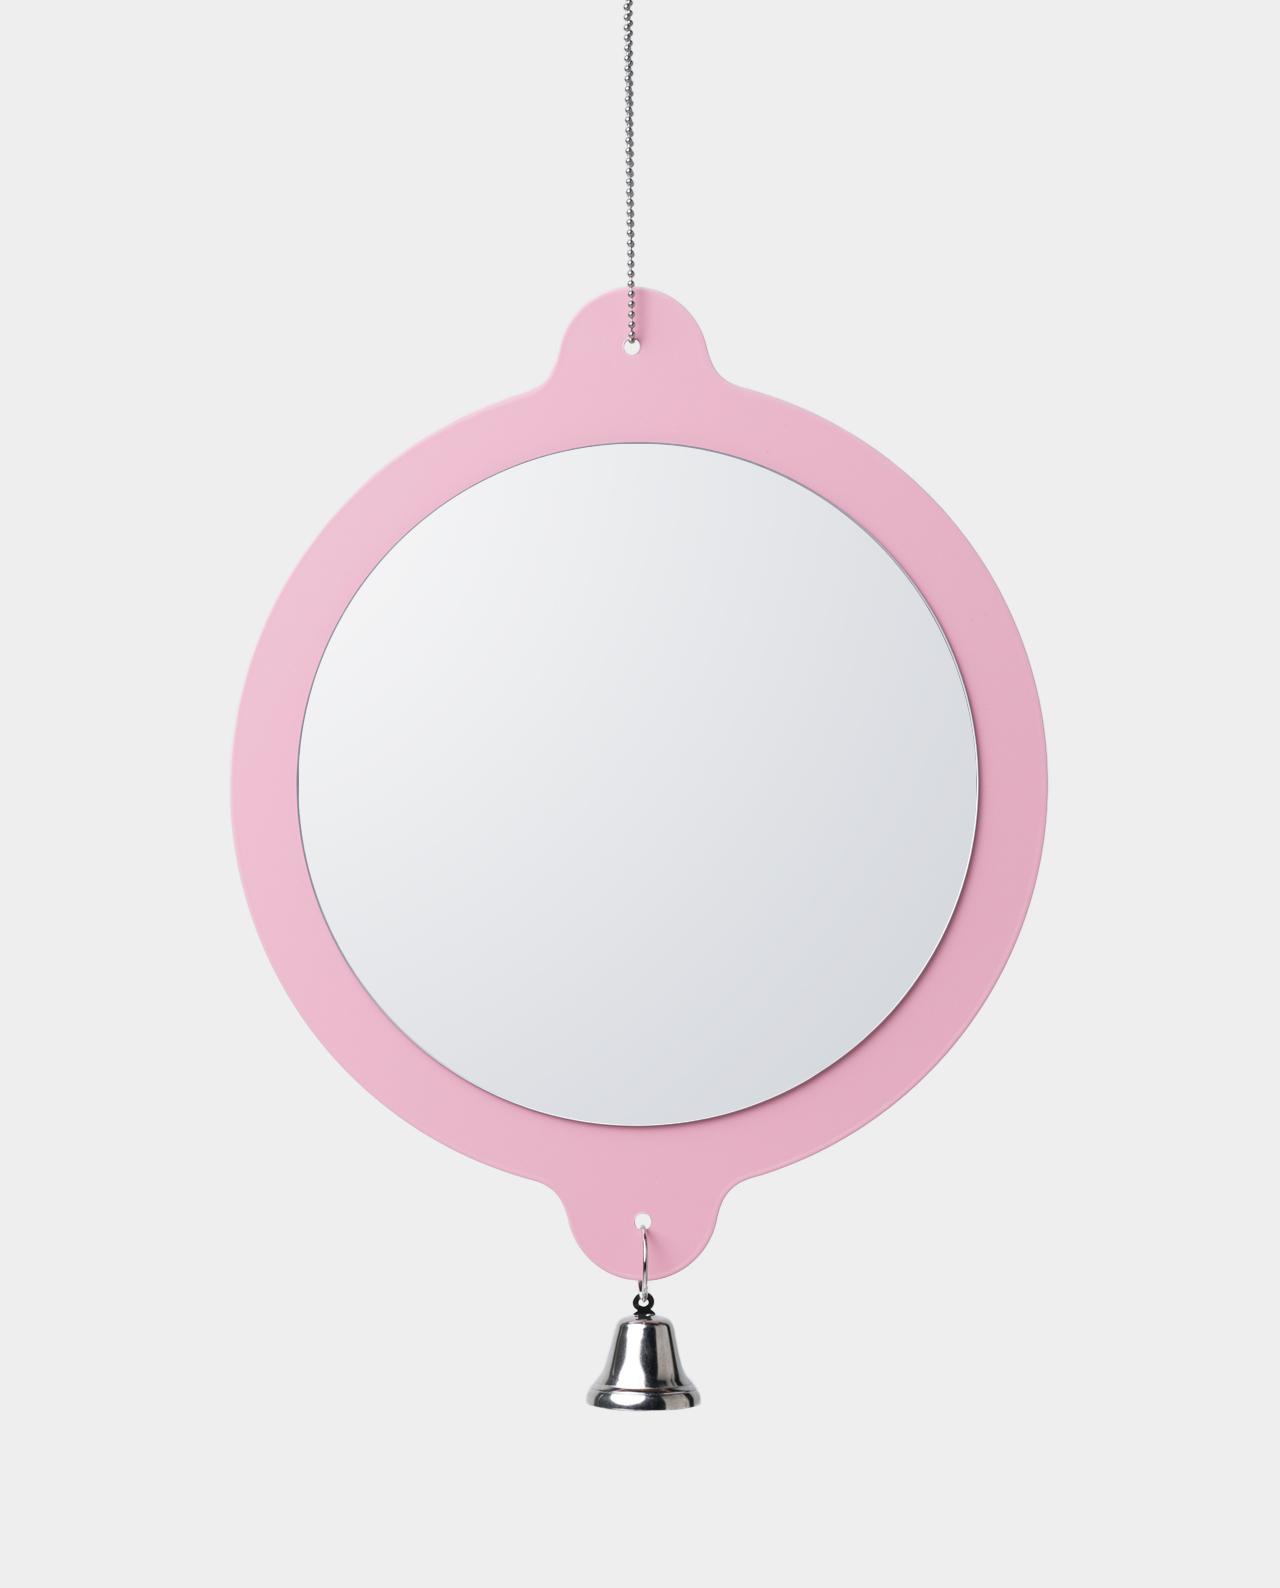 njustudio_hansi_mirror_pink